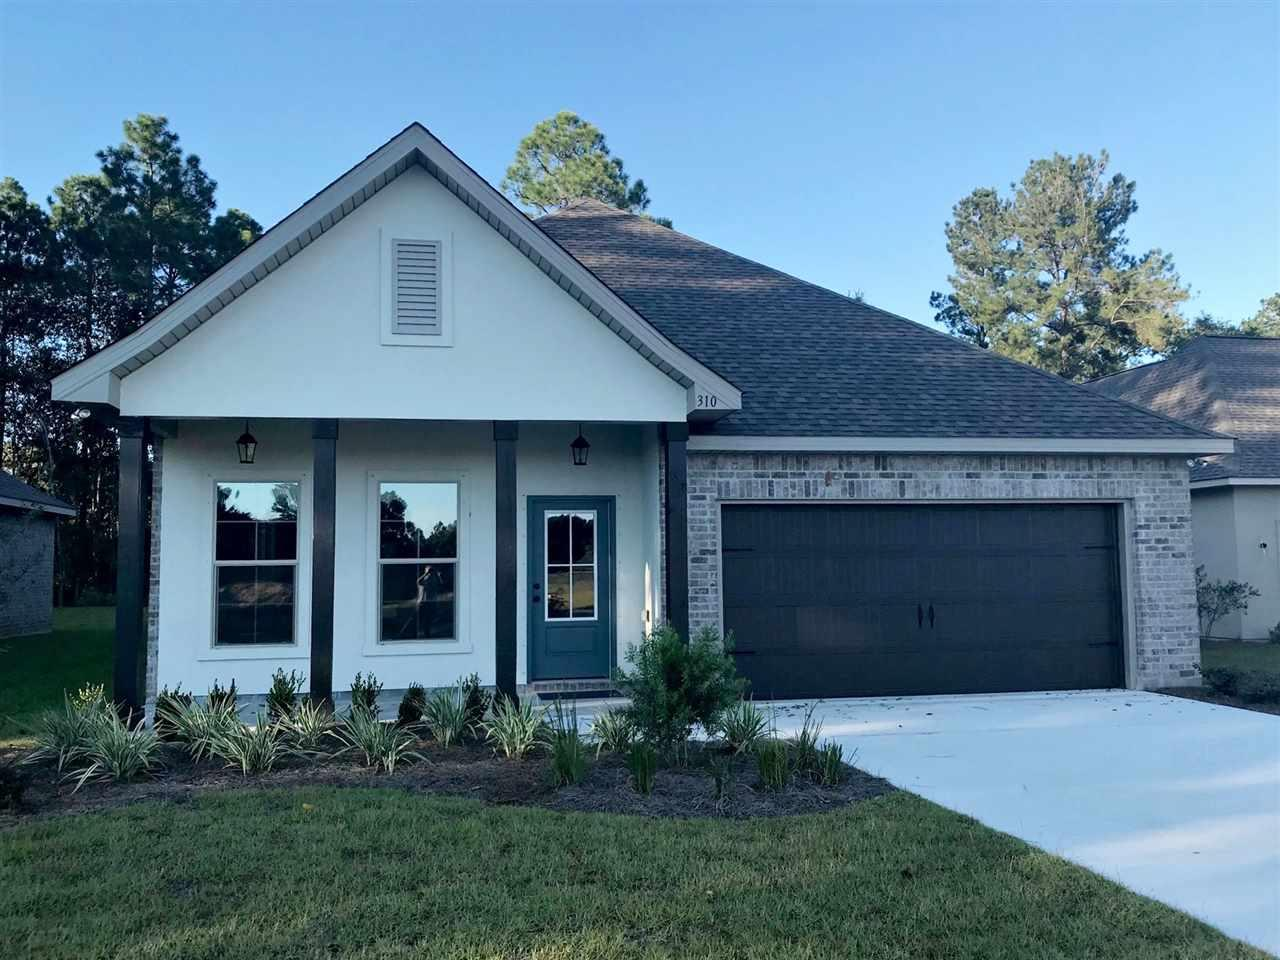 310 Topeka Rd, Pensacola, FL 32514